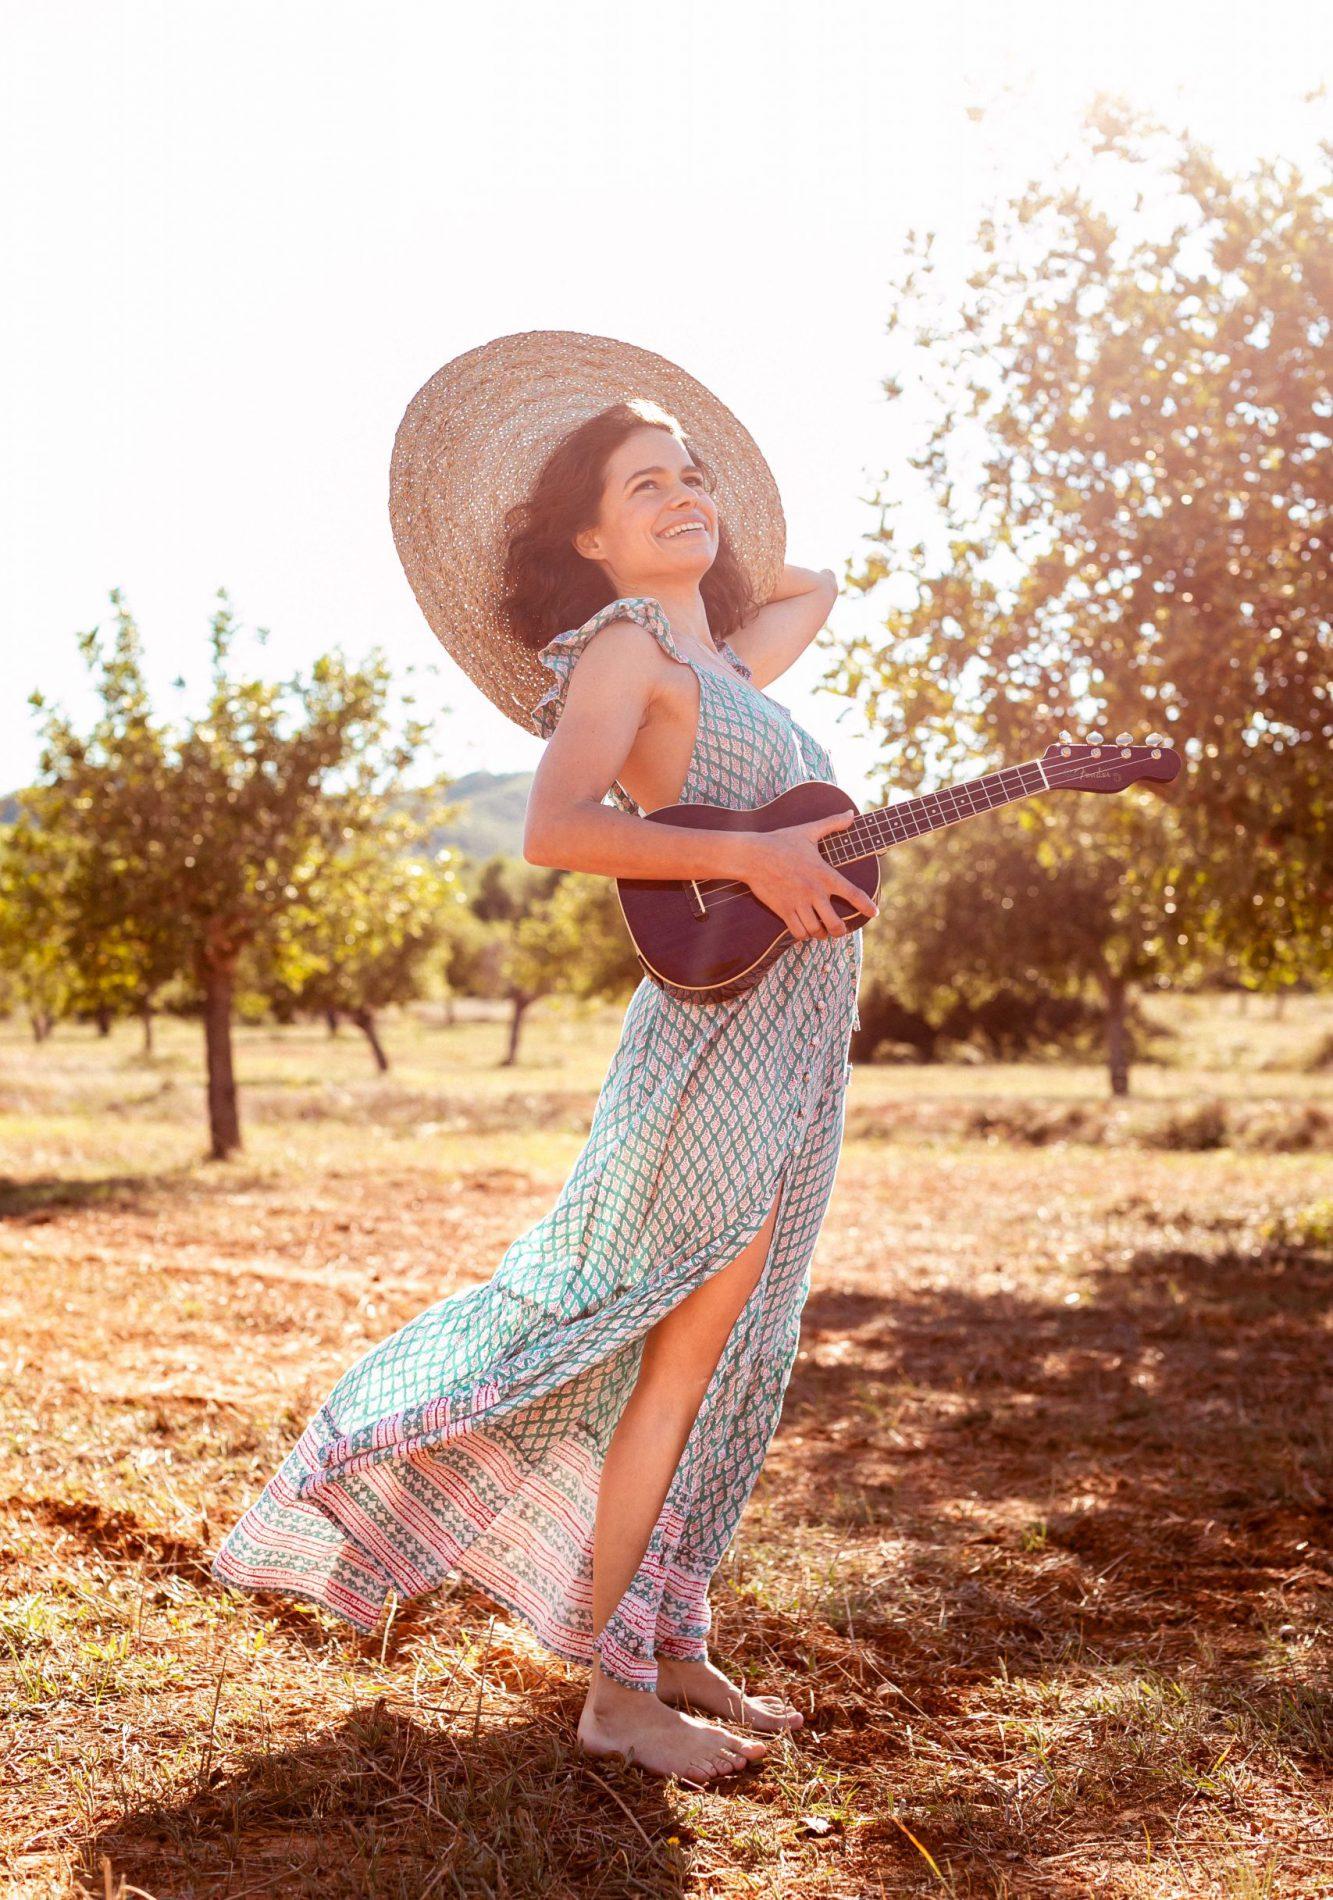 Maria Santos - portrait - art - ibiza - sesiones - lifestyle - shooting - woman - natural - love - artist - design - singer - beauty - cool - sea - awake